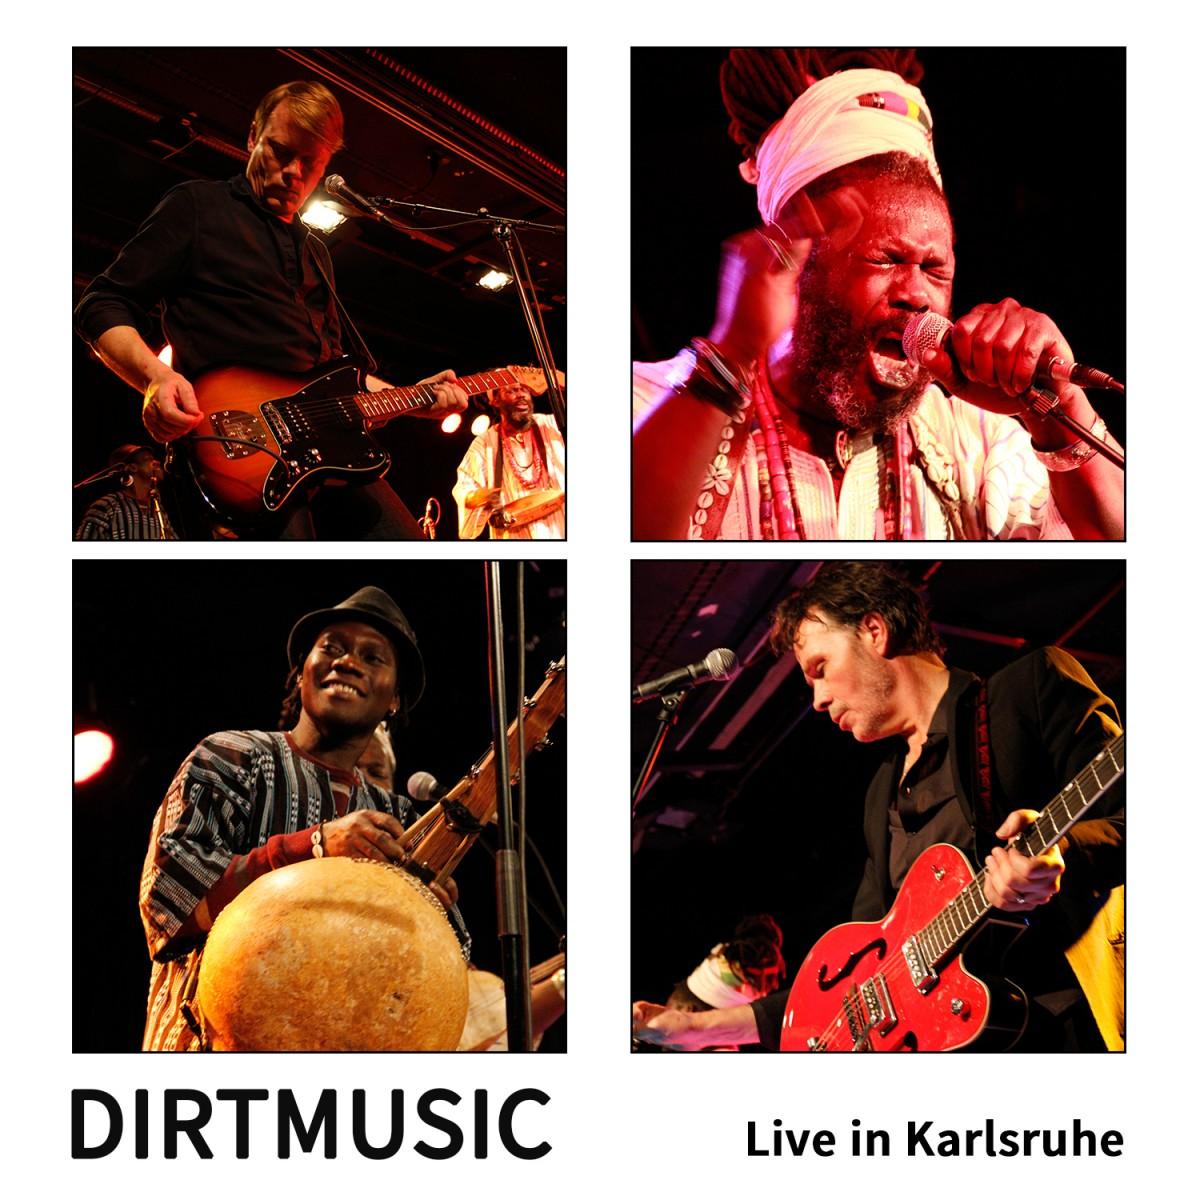 Dirtmusic: Live in Karlsruhe (2014)